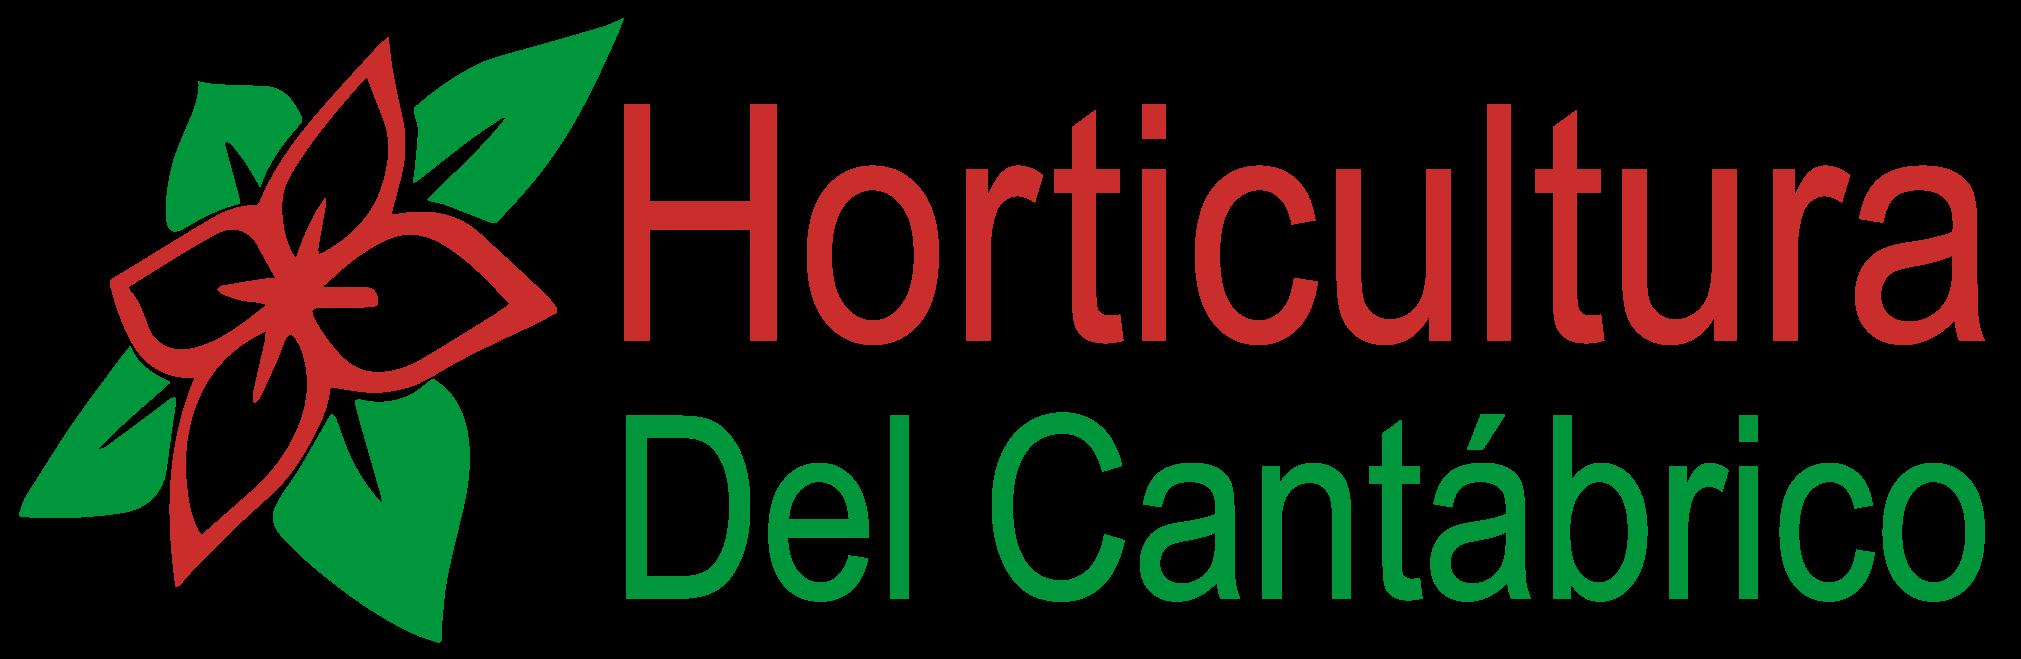 Horticultura del Cantábrico S.L.